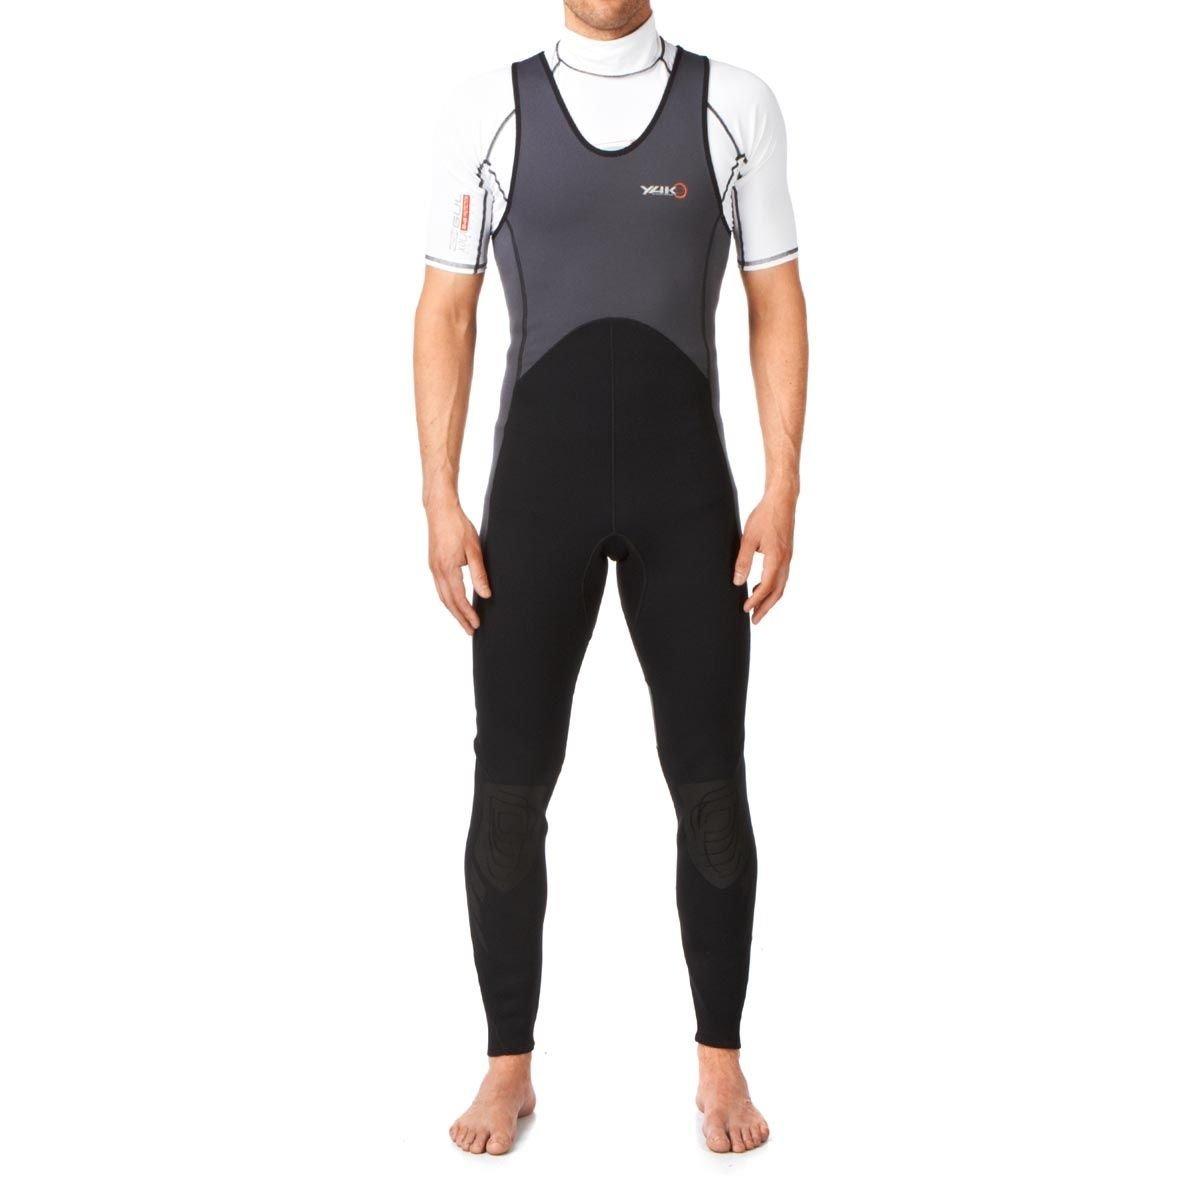 Yak 'Step In' 3mm Long John Wetsuit Grey/Black 5405-A Sizes- - Medium   B0085JWGDM